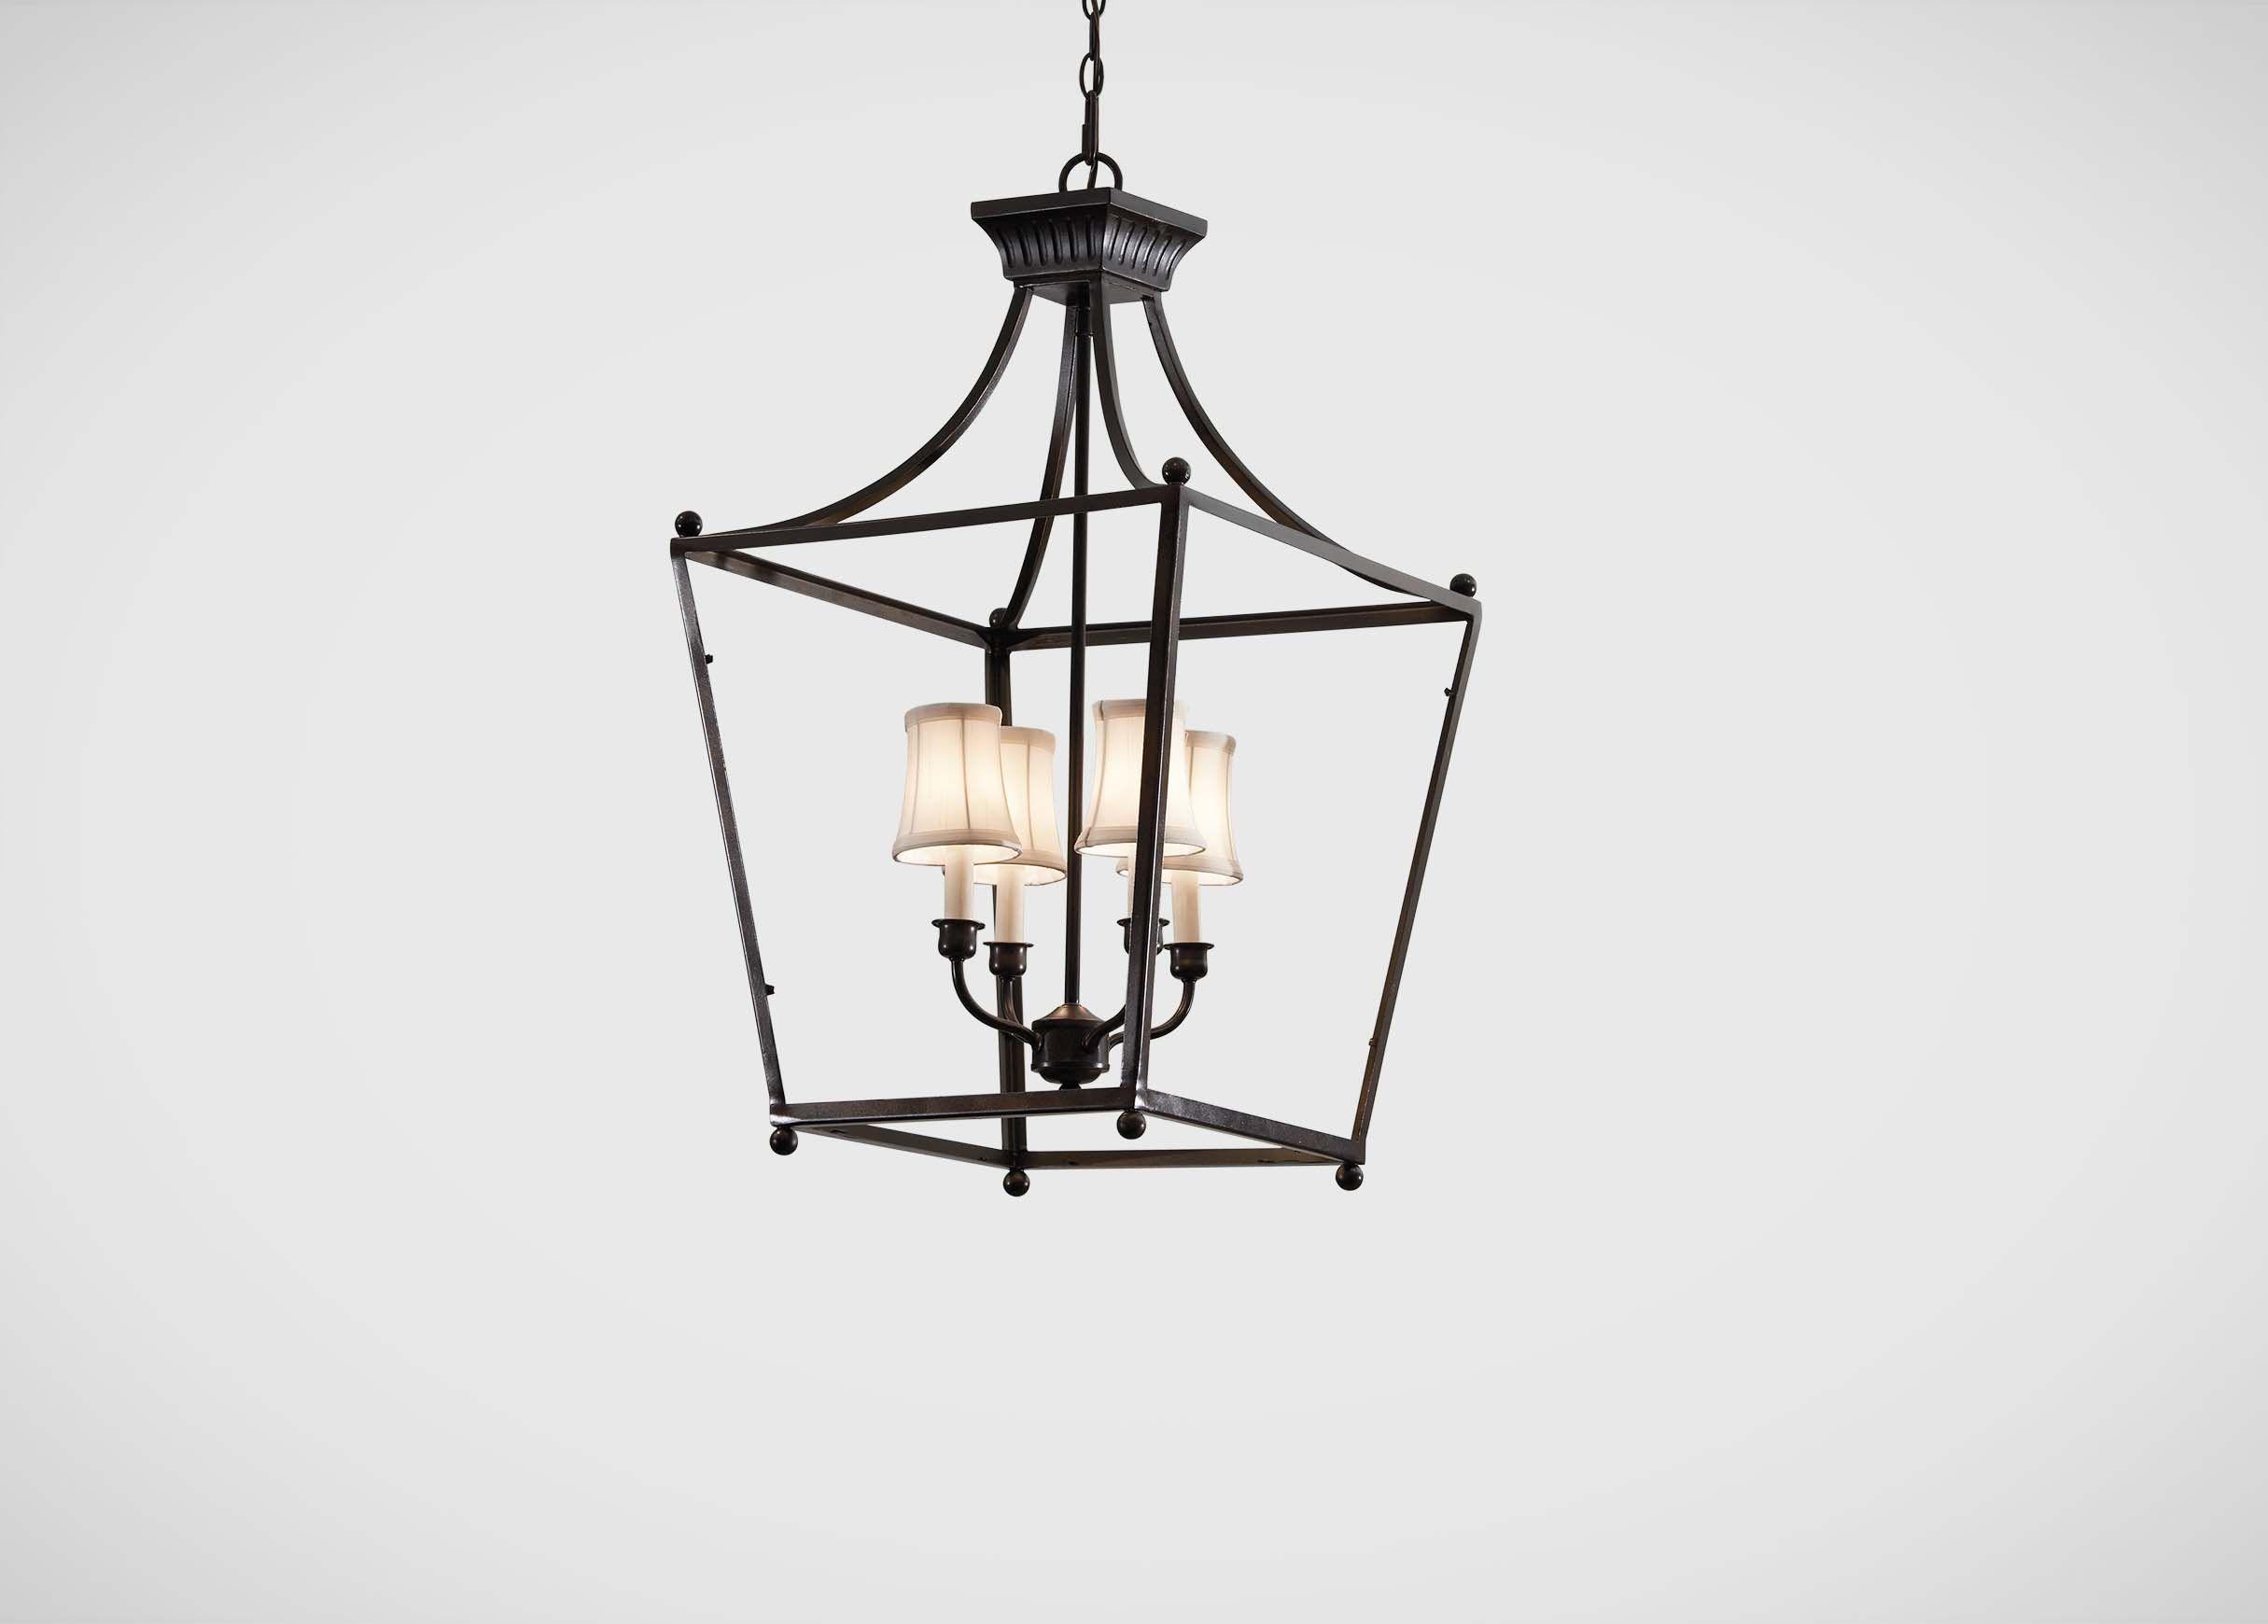 As seen in hgtv dream home ethan allen stockton bronze lantern as seen in hgtv dream home ethan allen stockton bronze lantern aloadofball Gallery